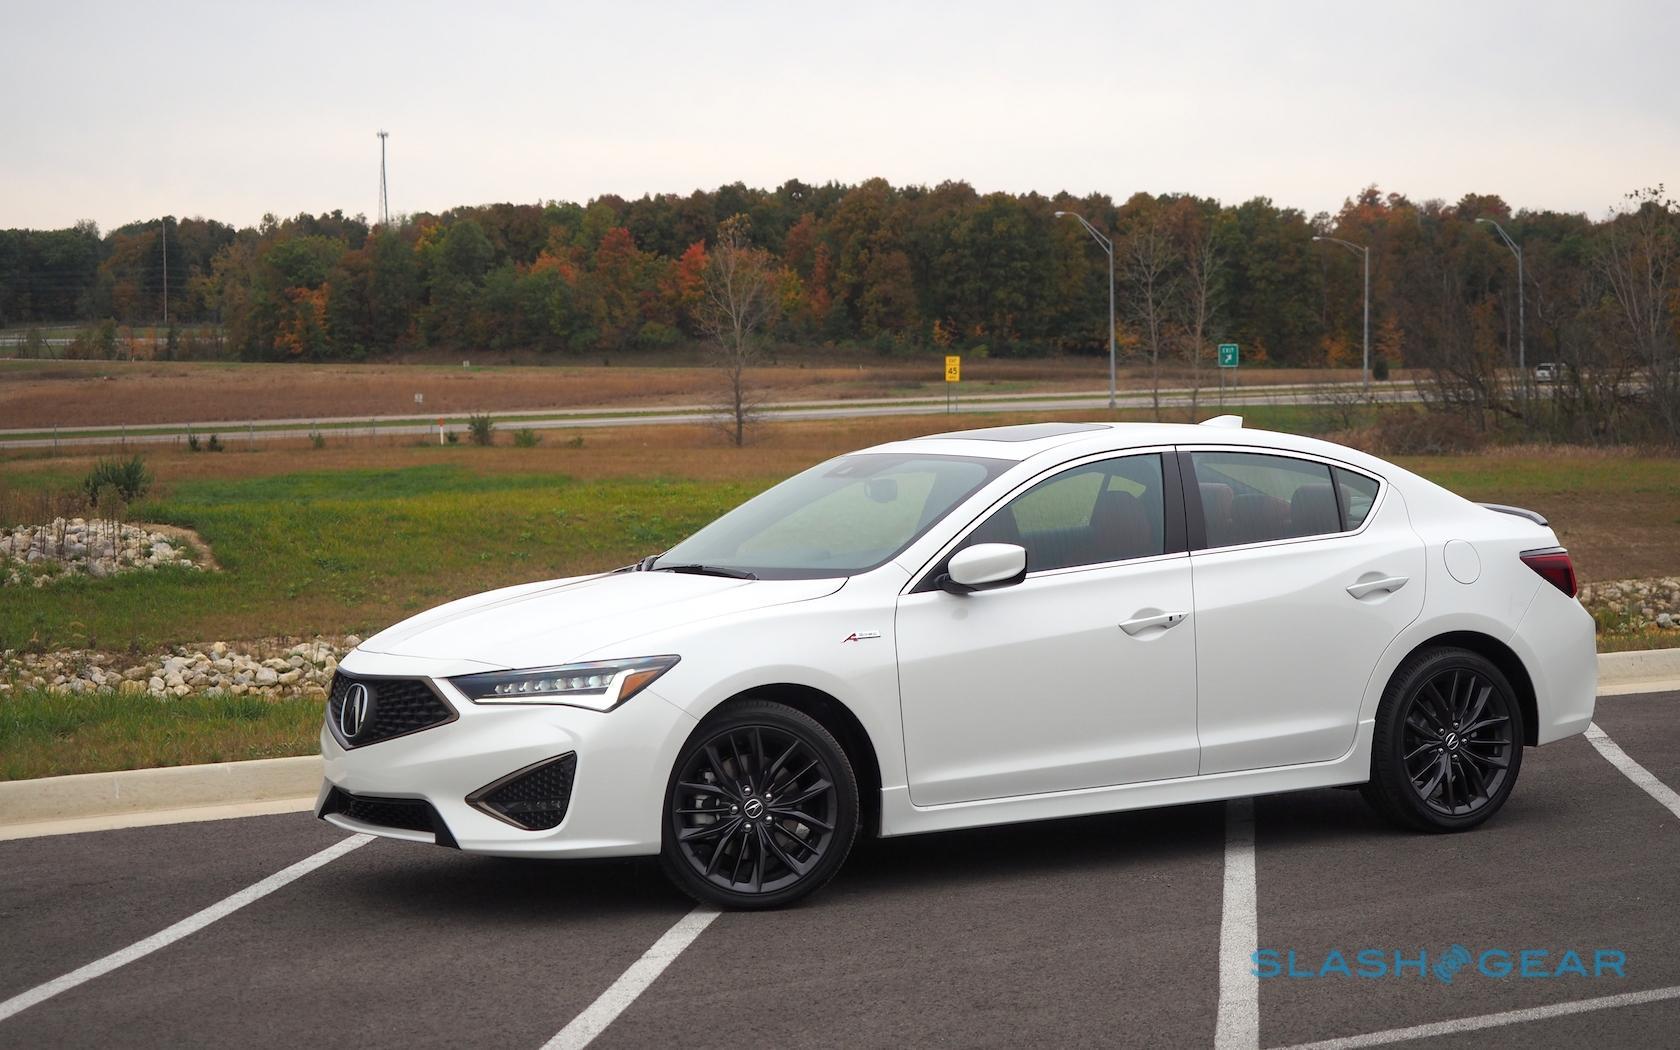 2019 Acura ILX first drive: Distinctively safer - SlashGear